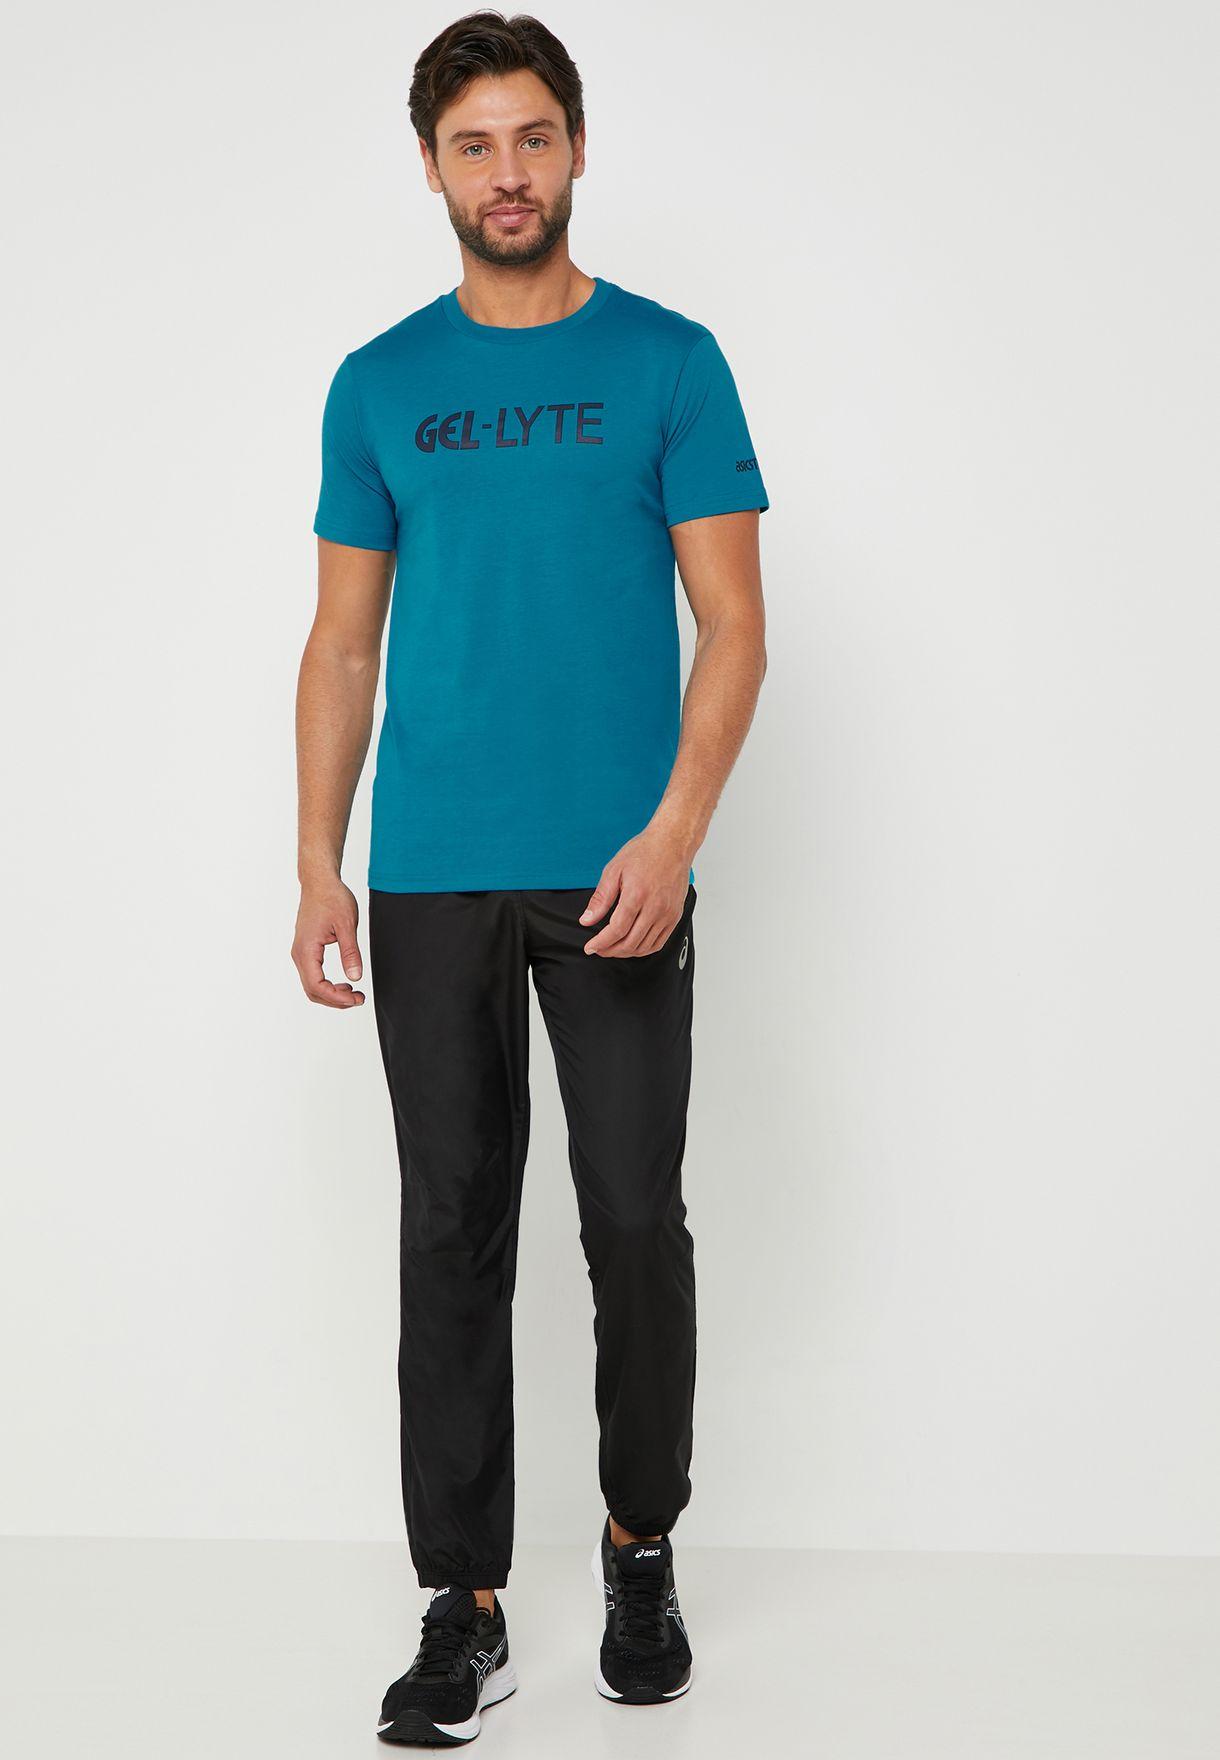 GEL-Lyte T-Shirt